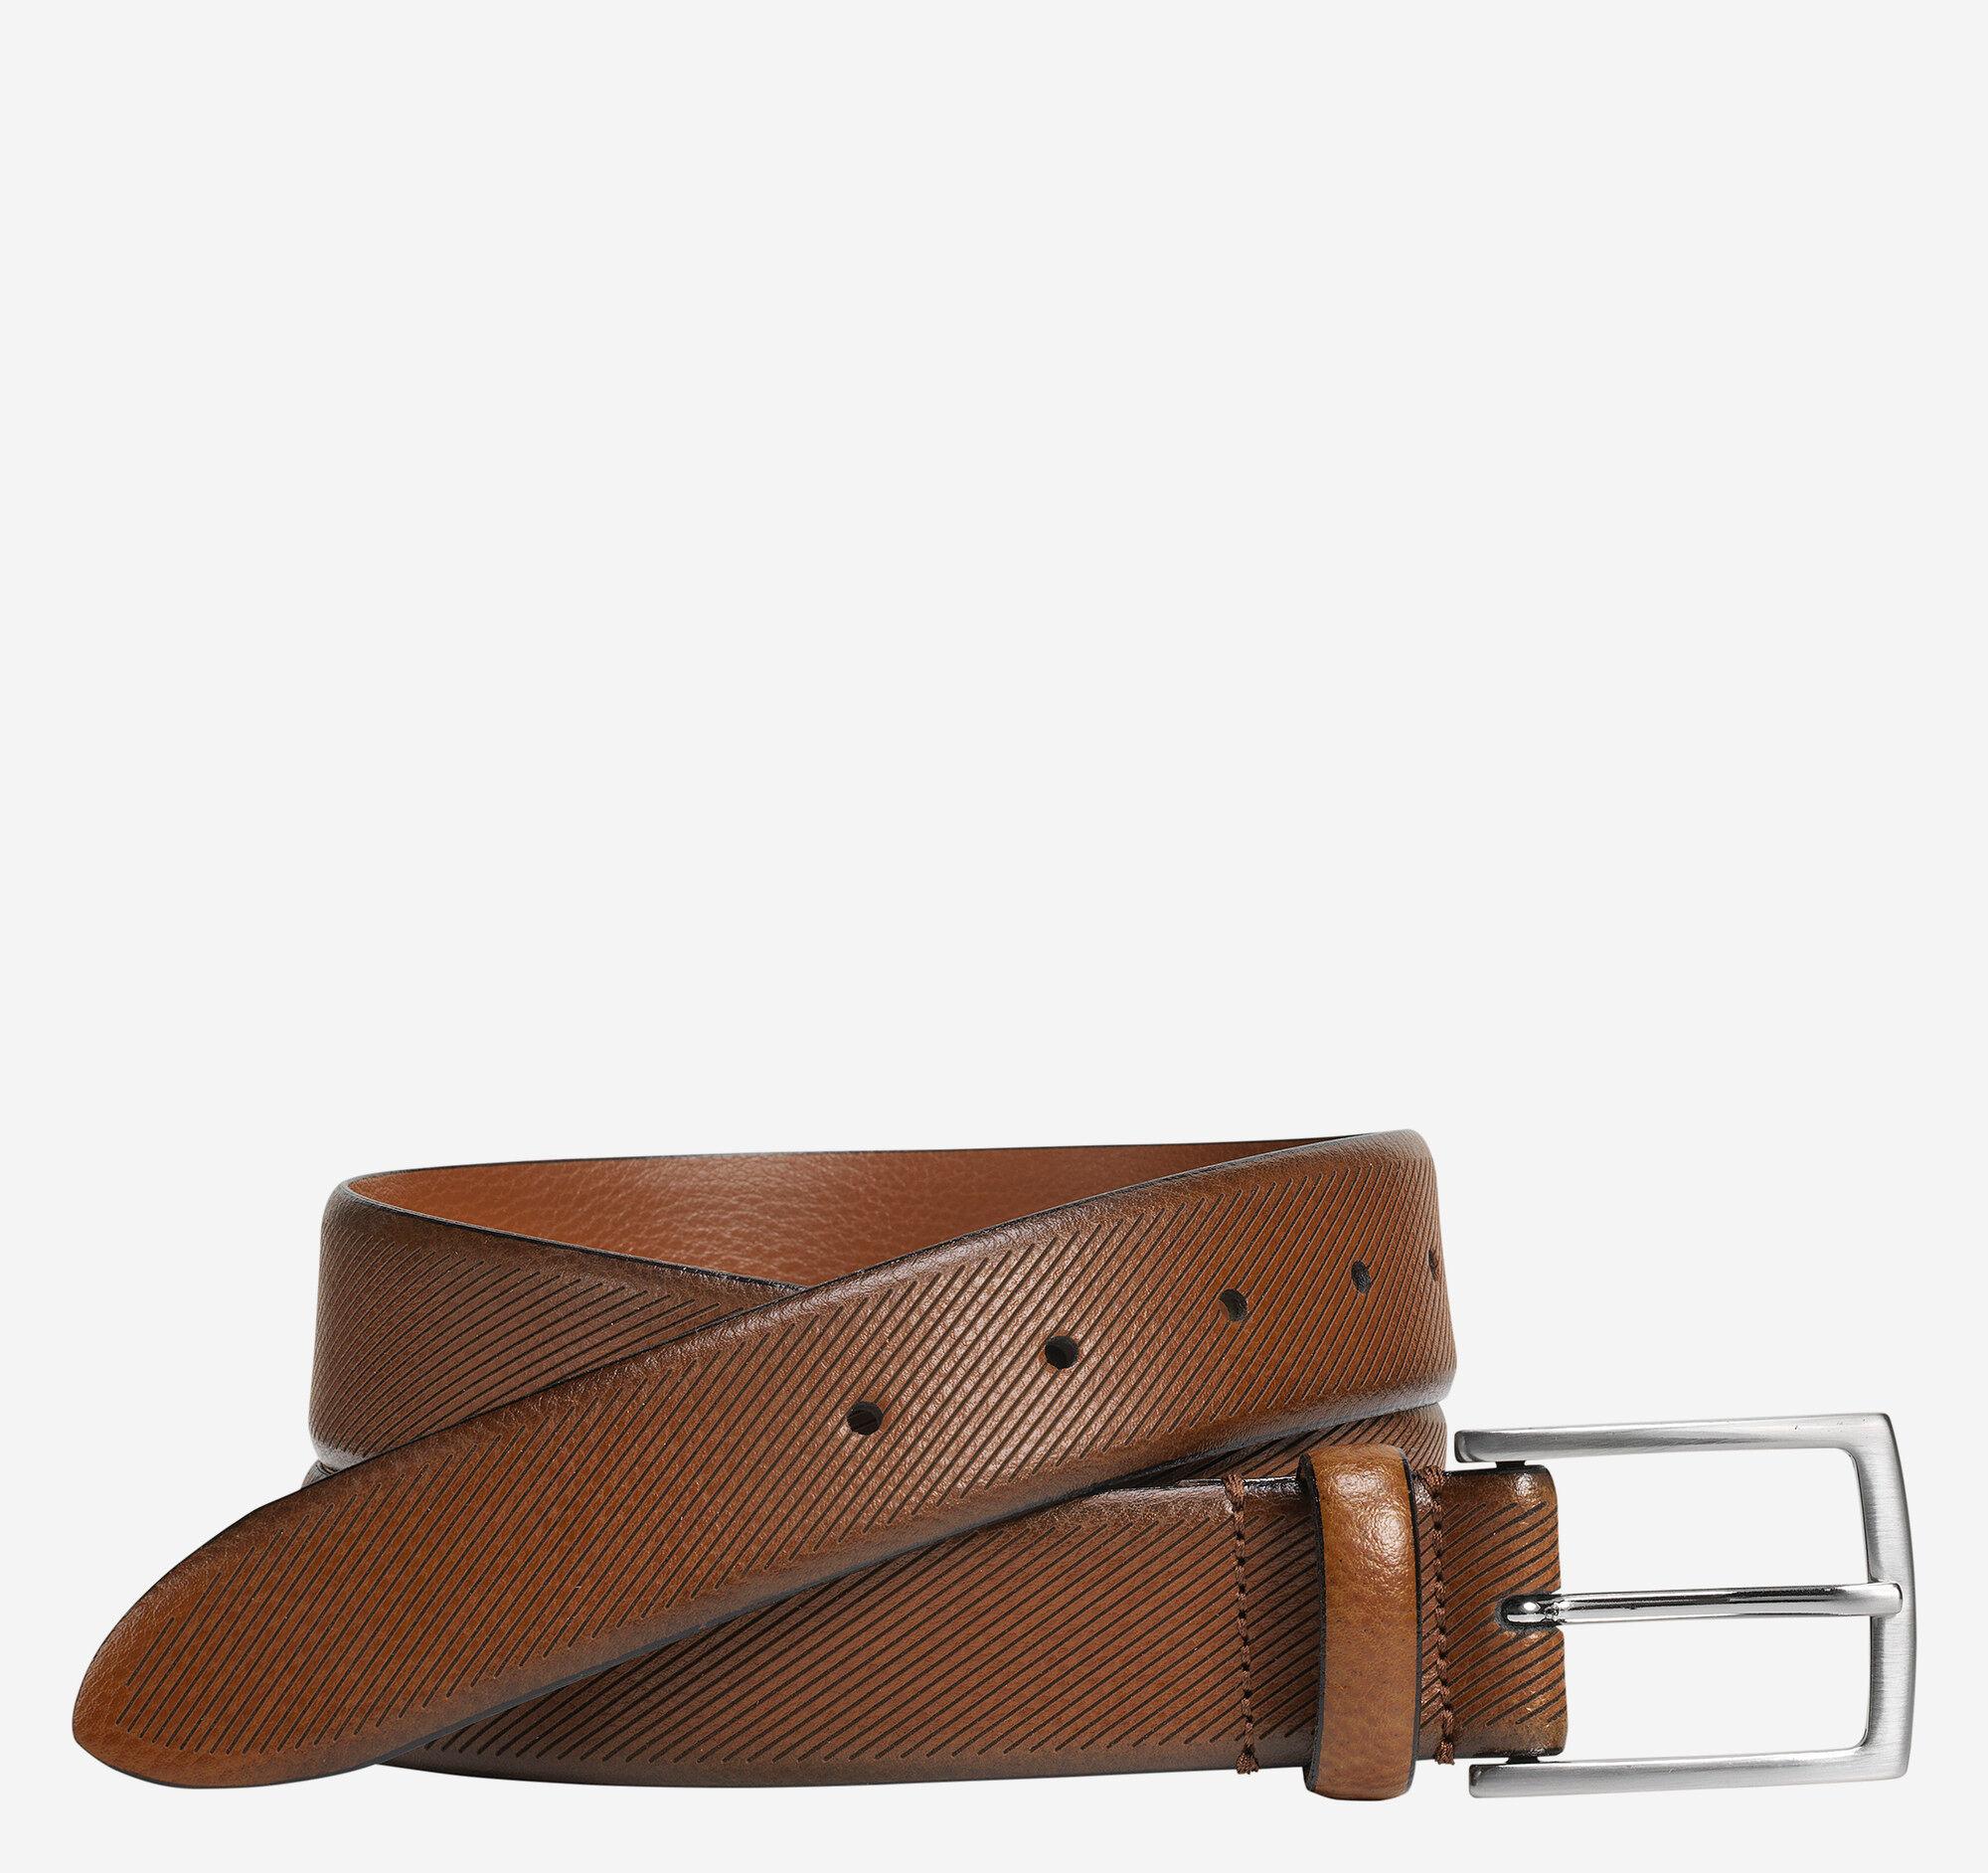 Johnston & Murphy Men's Diagonal Embossed Belt - Tan - Size 32